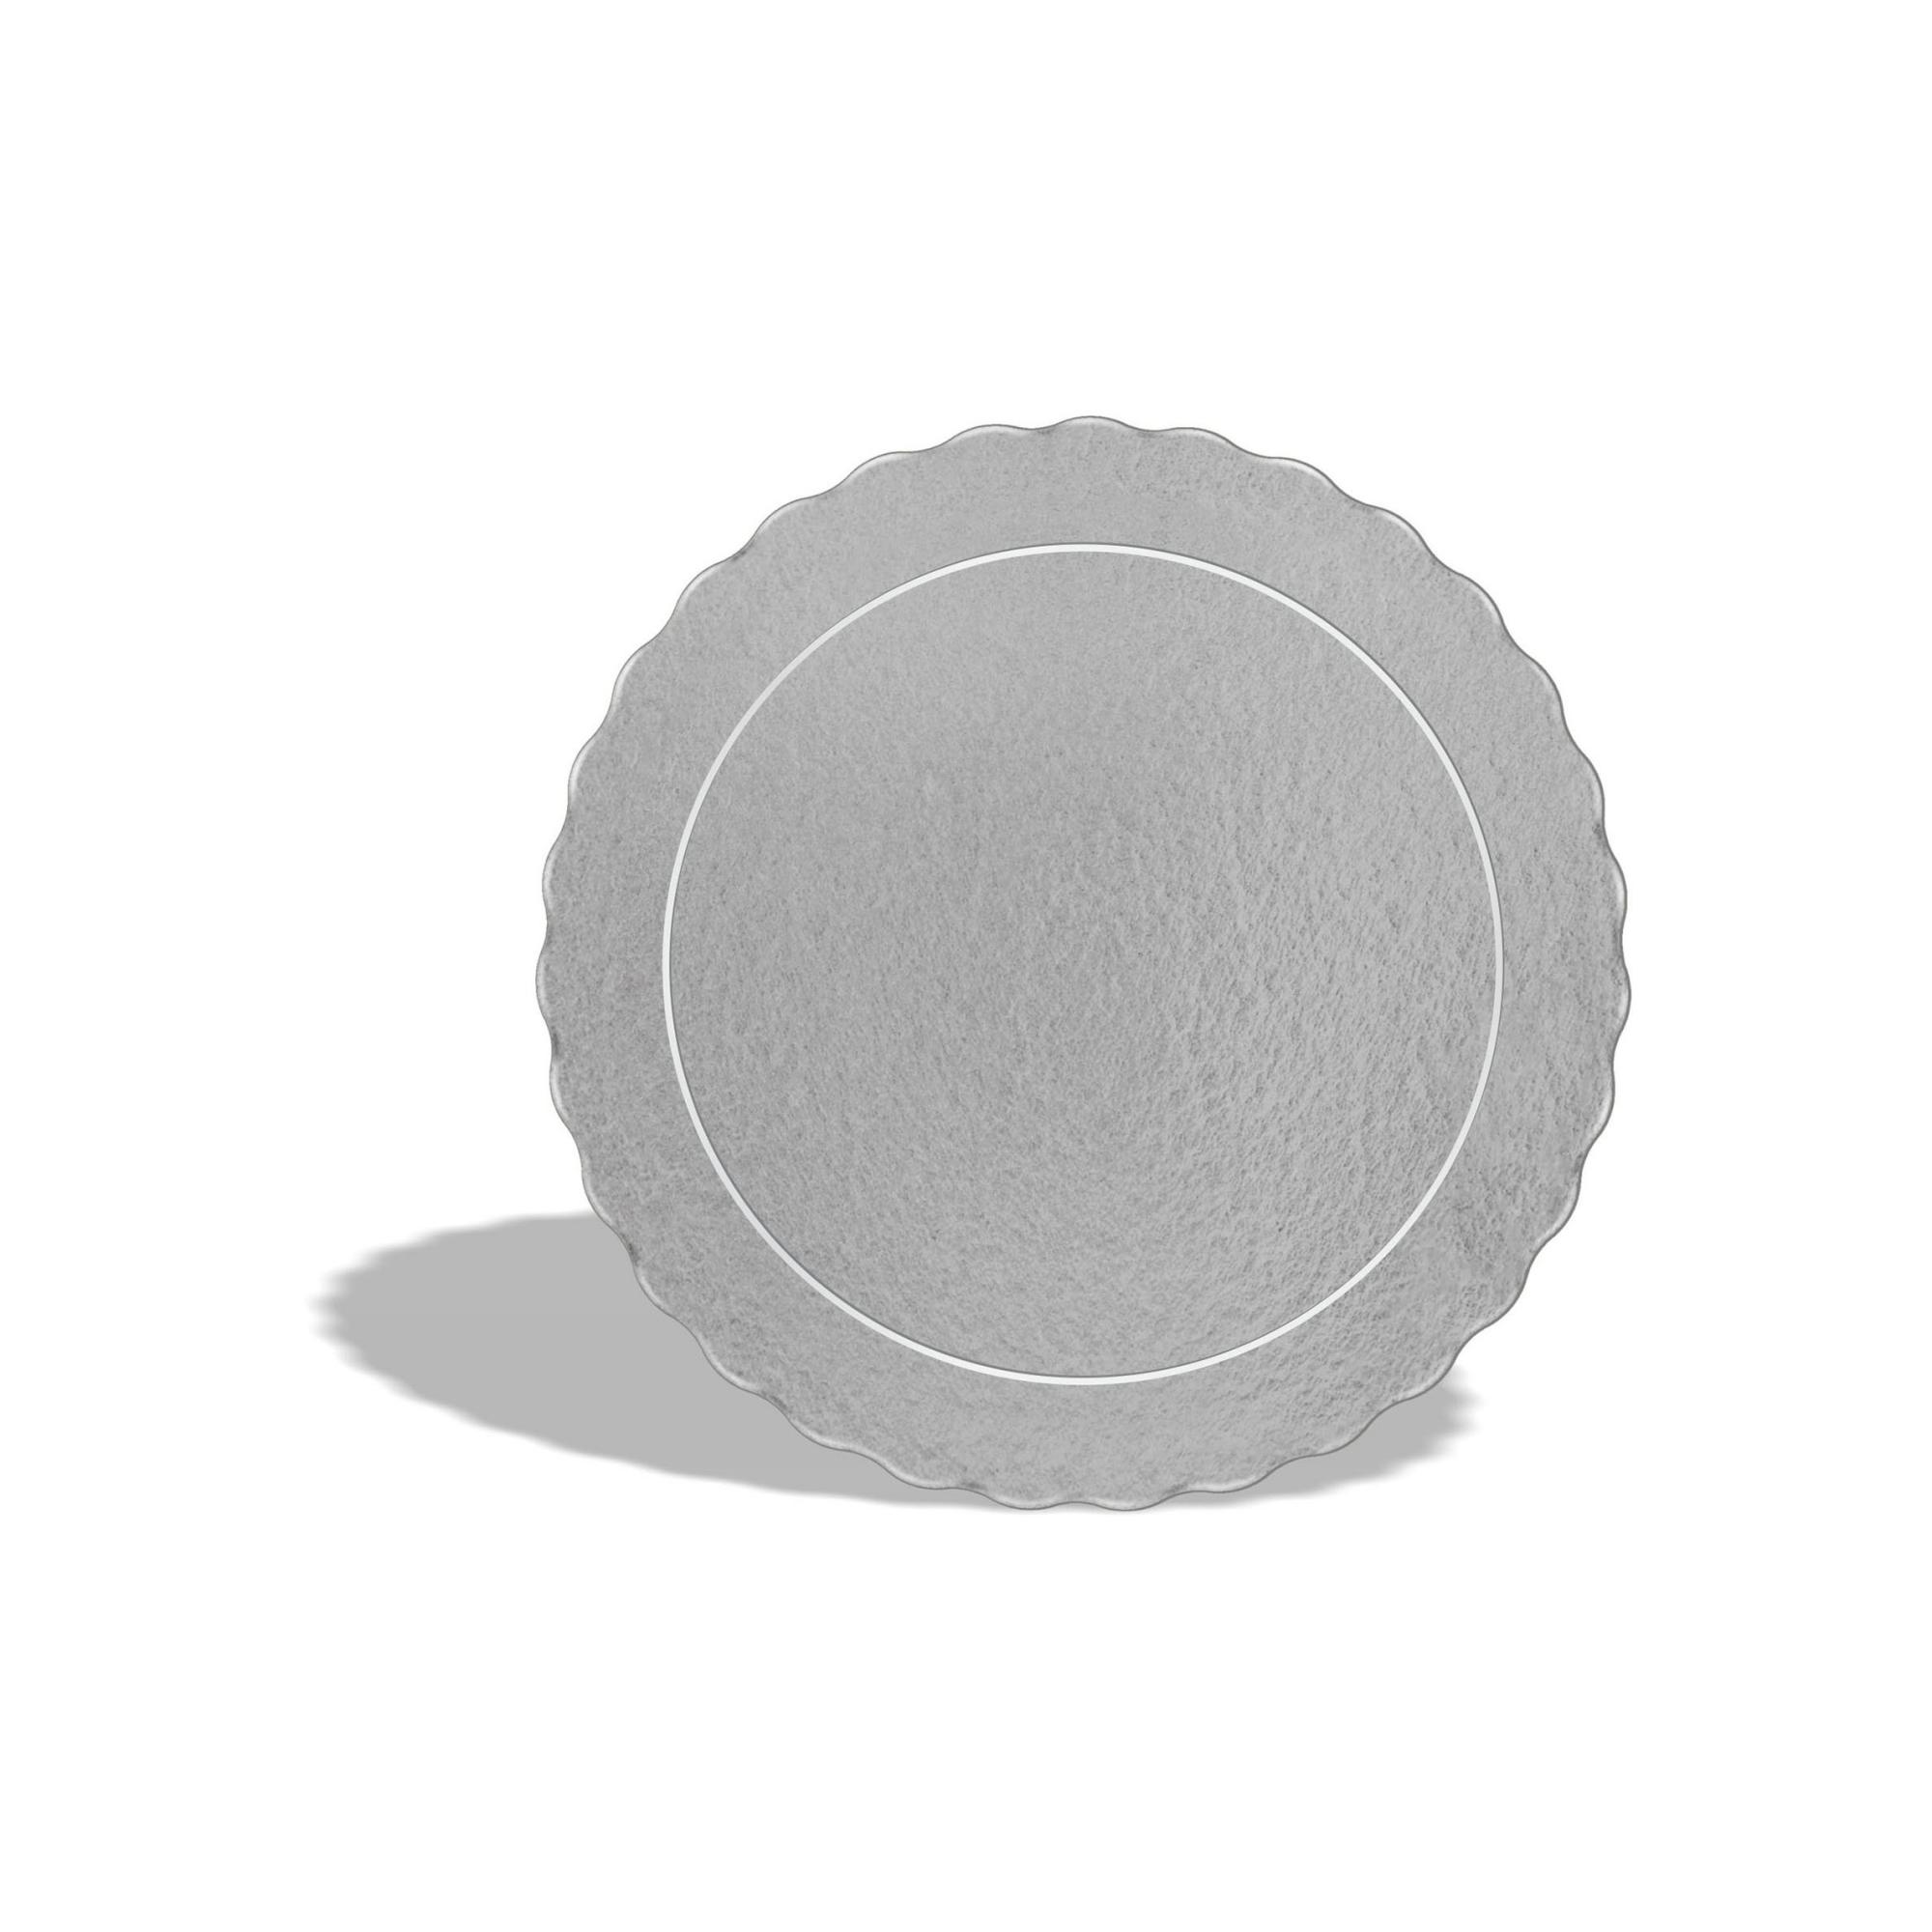 200 Bases Laminadas, Suporte P/ Bolo, Cake Board, 20cm - Prata